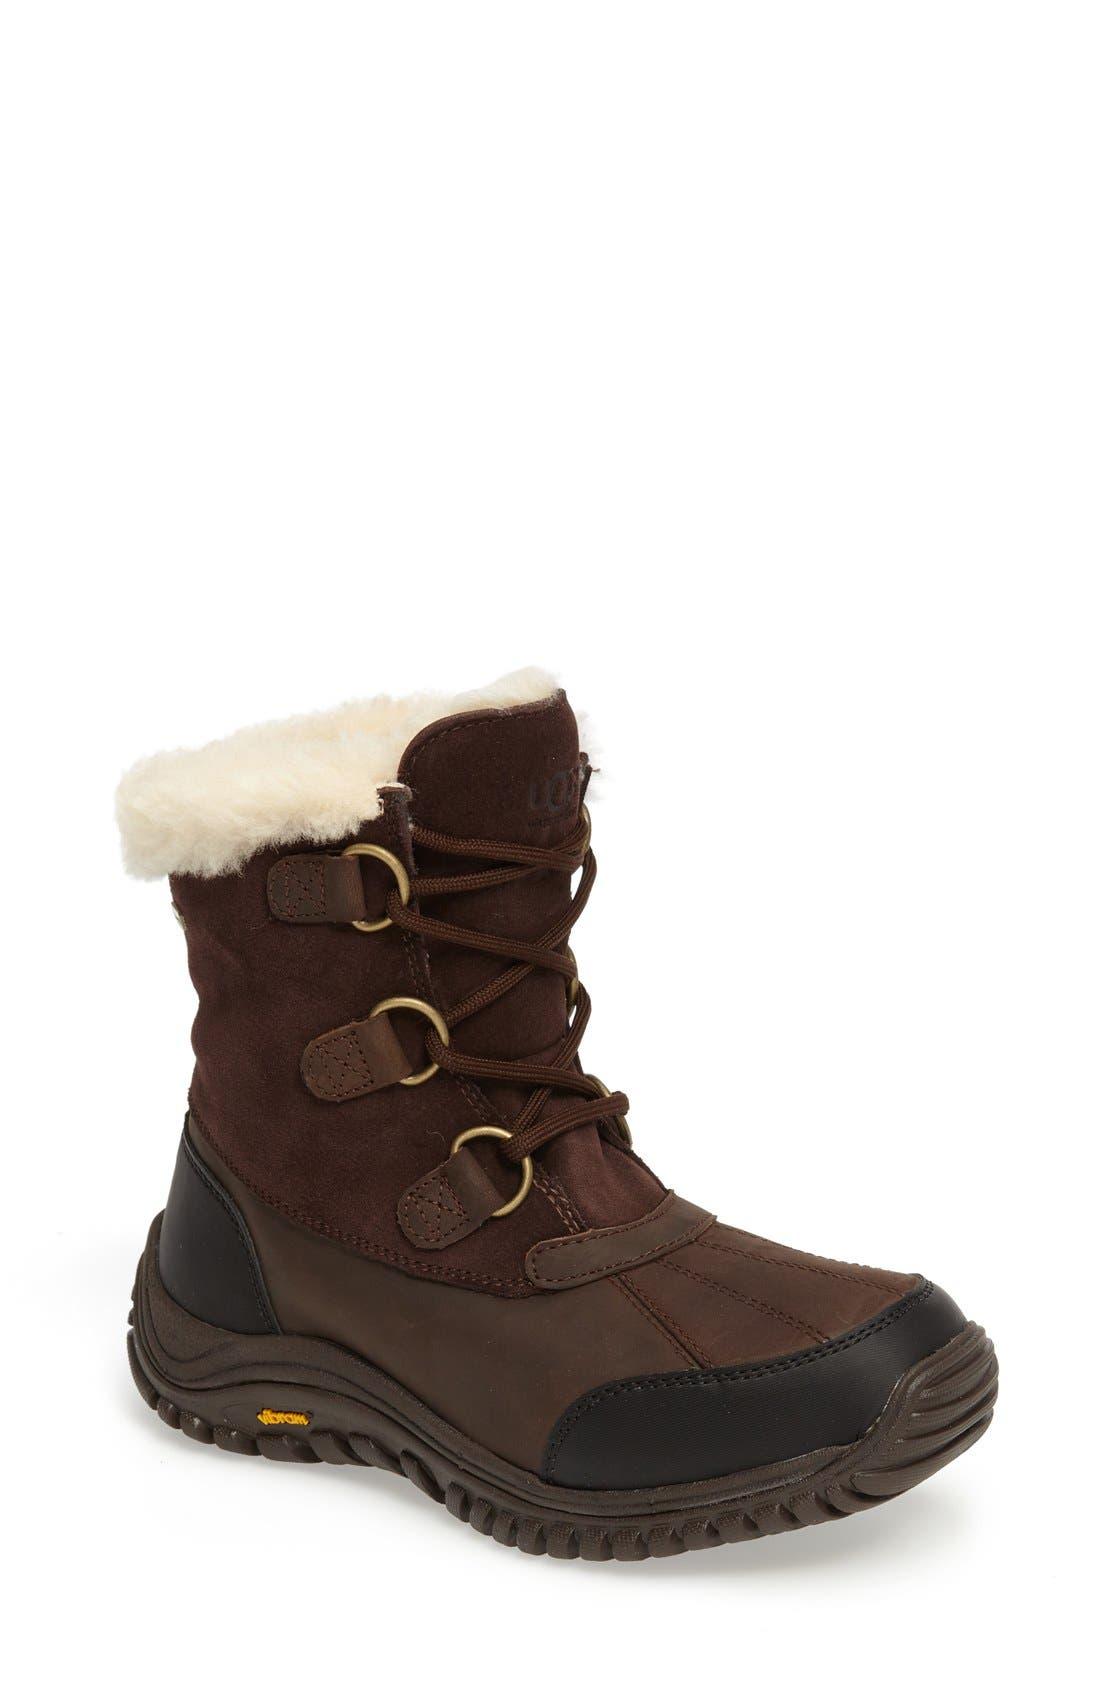 Alternate Image 1 Selected - UGG® Ostrander Waterproof Winter Boot (Women)